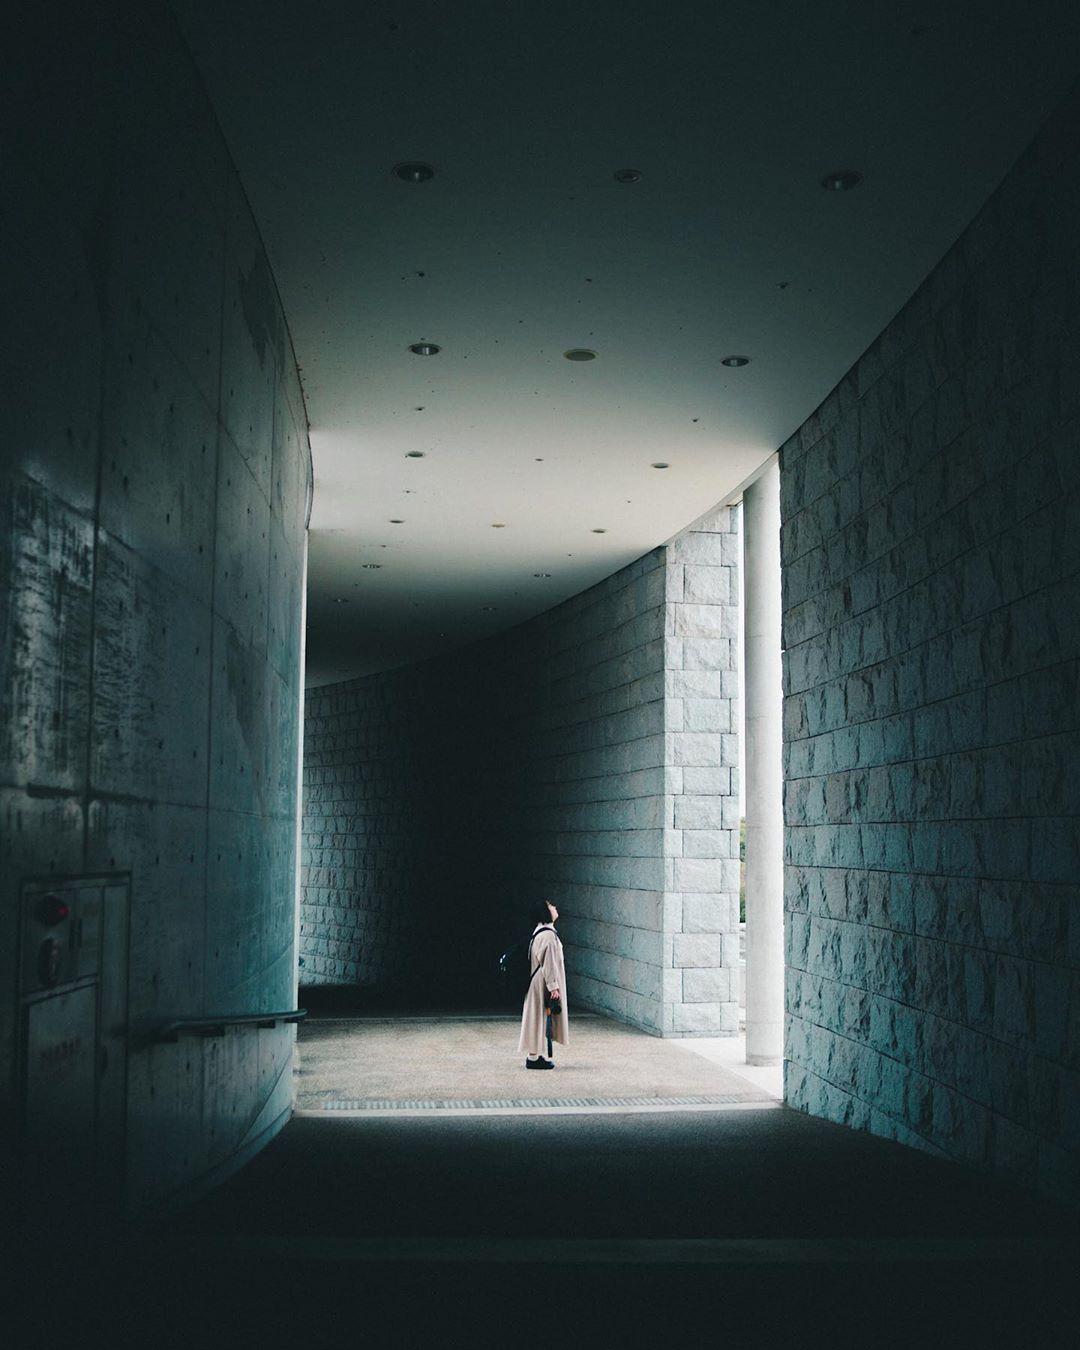 "Ryunosuke Imakubo on Instagram: "". 『独』 . . 1人の時間は多すぎると寂しいが 少な過ぎると疲れる . . 僕は1人の時間多い方が好き 考えることが好きだから😌 . . location: 明石海峡国営公園 model: @natchan14173 . . . ━━━━━━━━━━━━━━━━━…"""